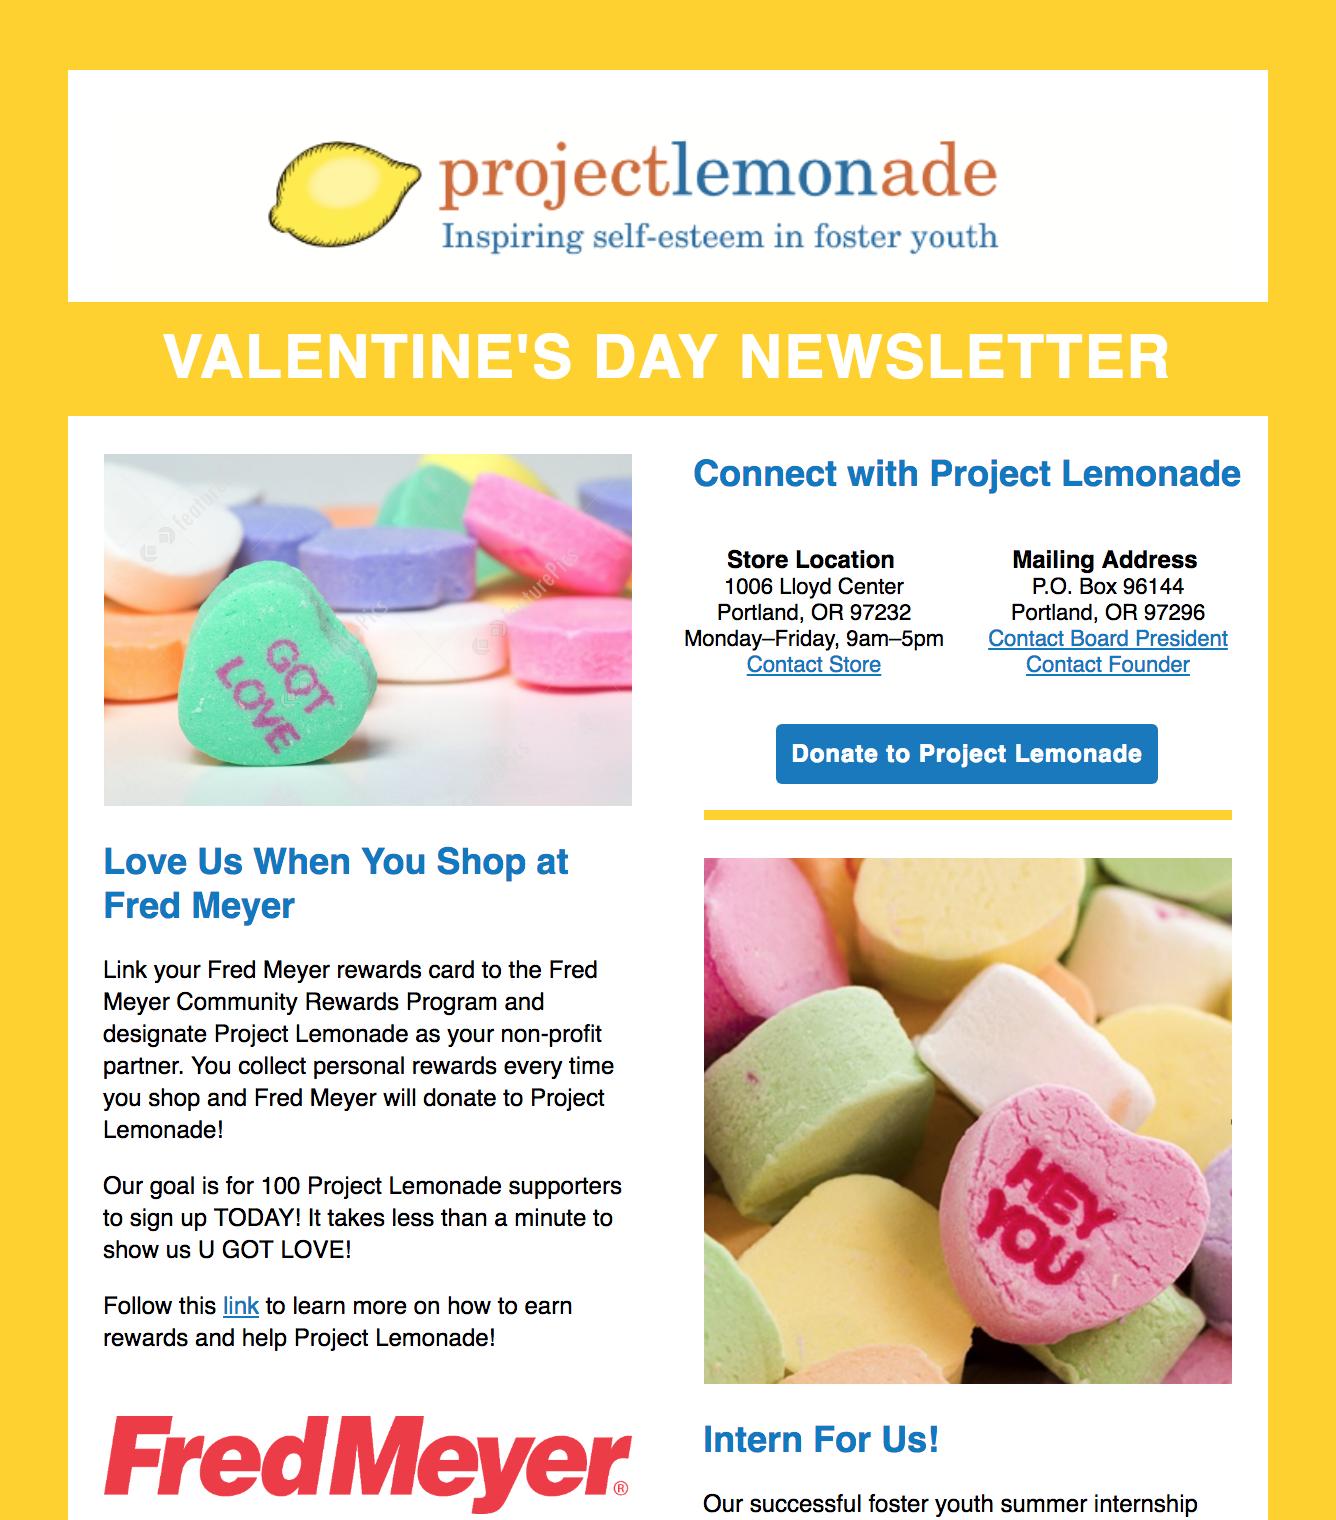 Valentine S Day Newsletter Project Lemonade Inspiring Self Esteem